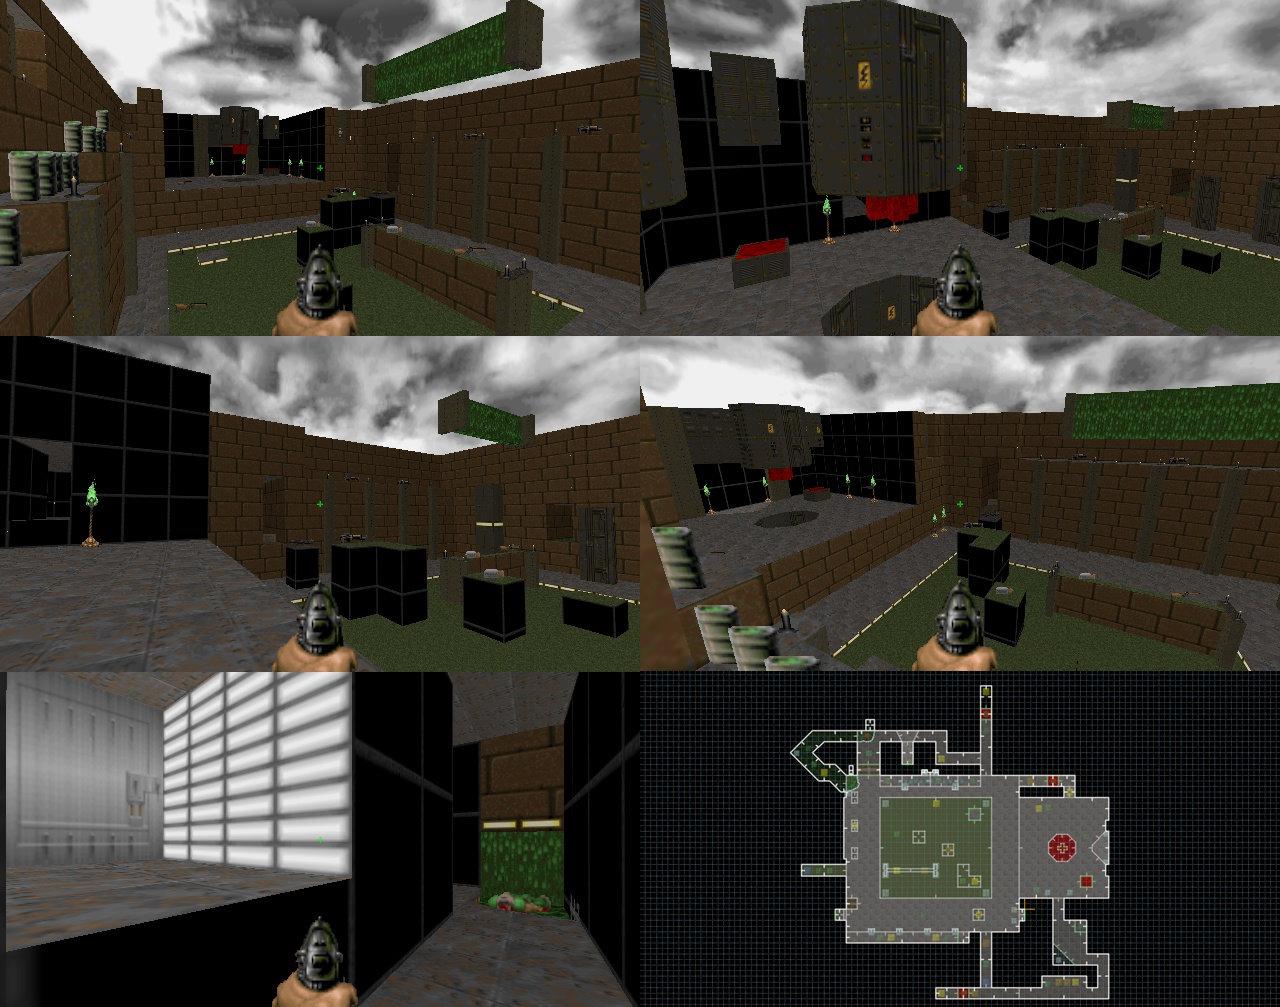 Jens Roesner - Games